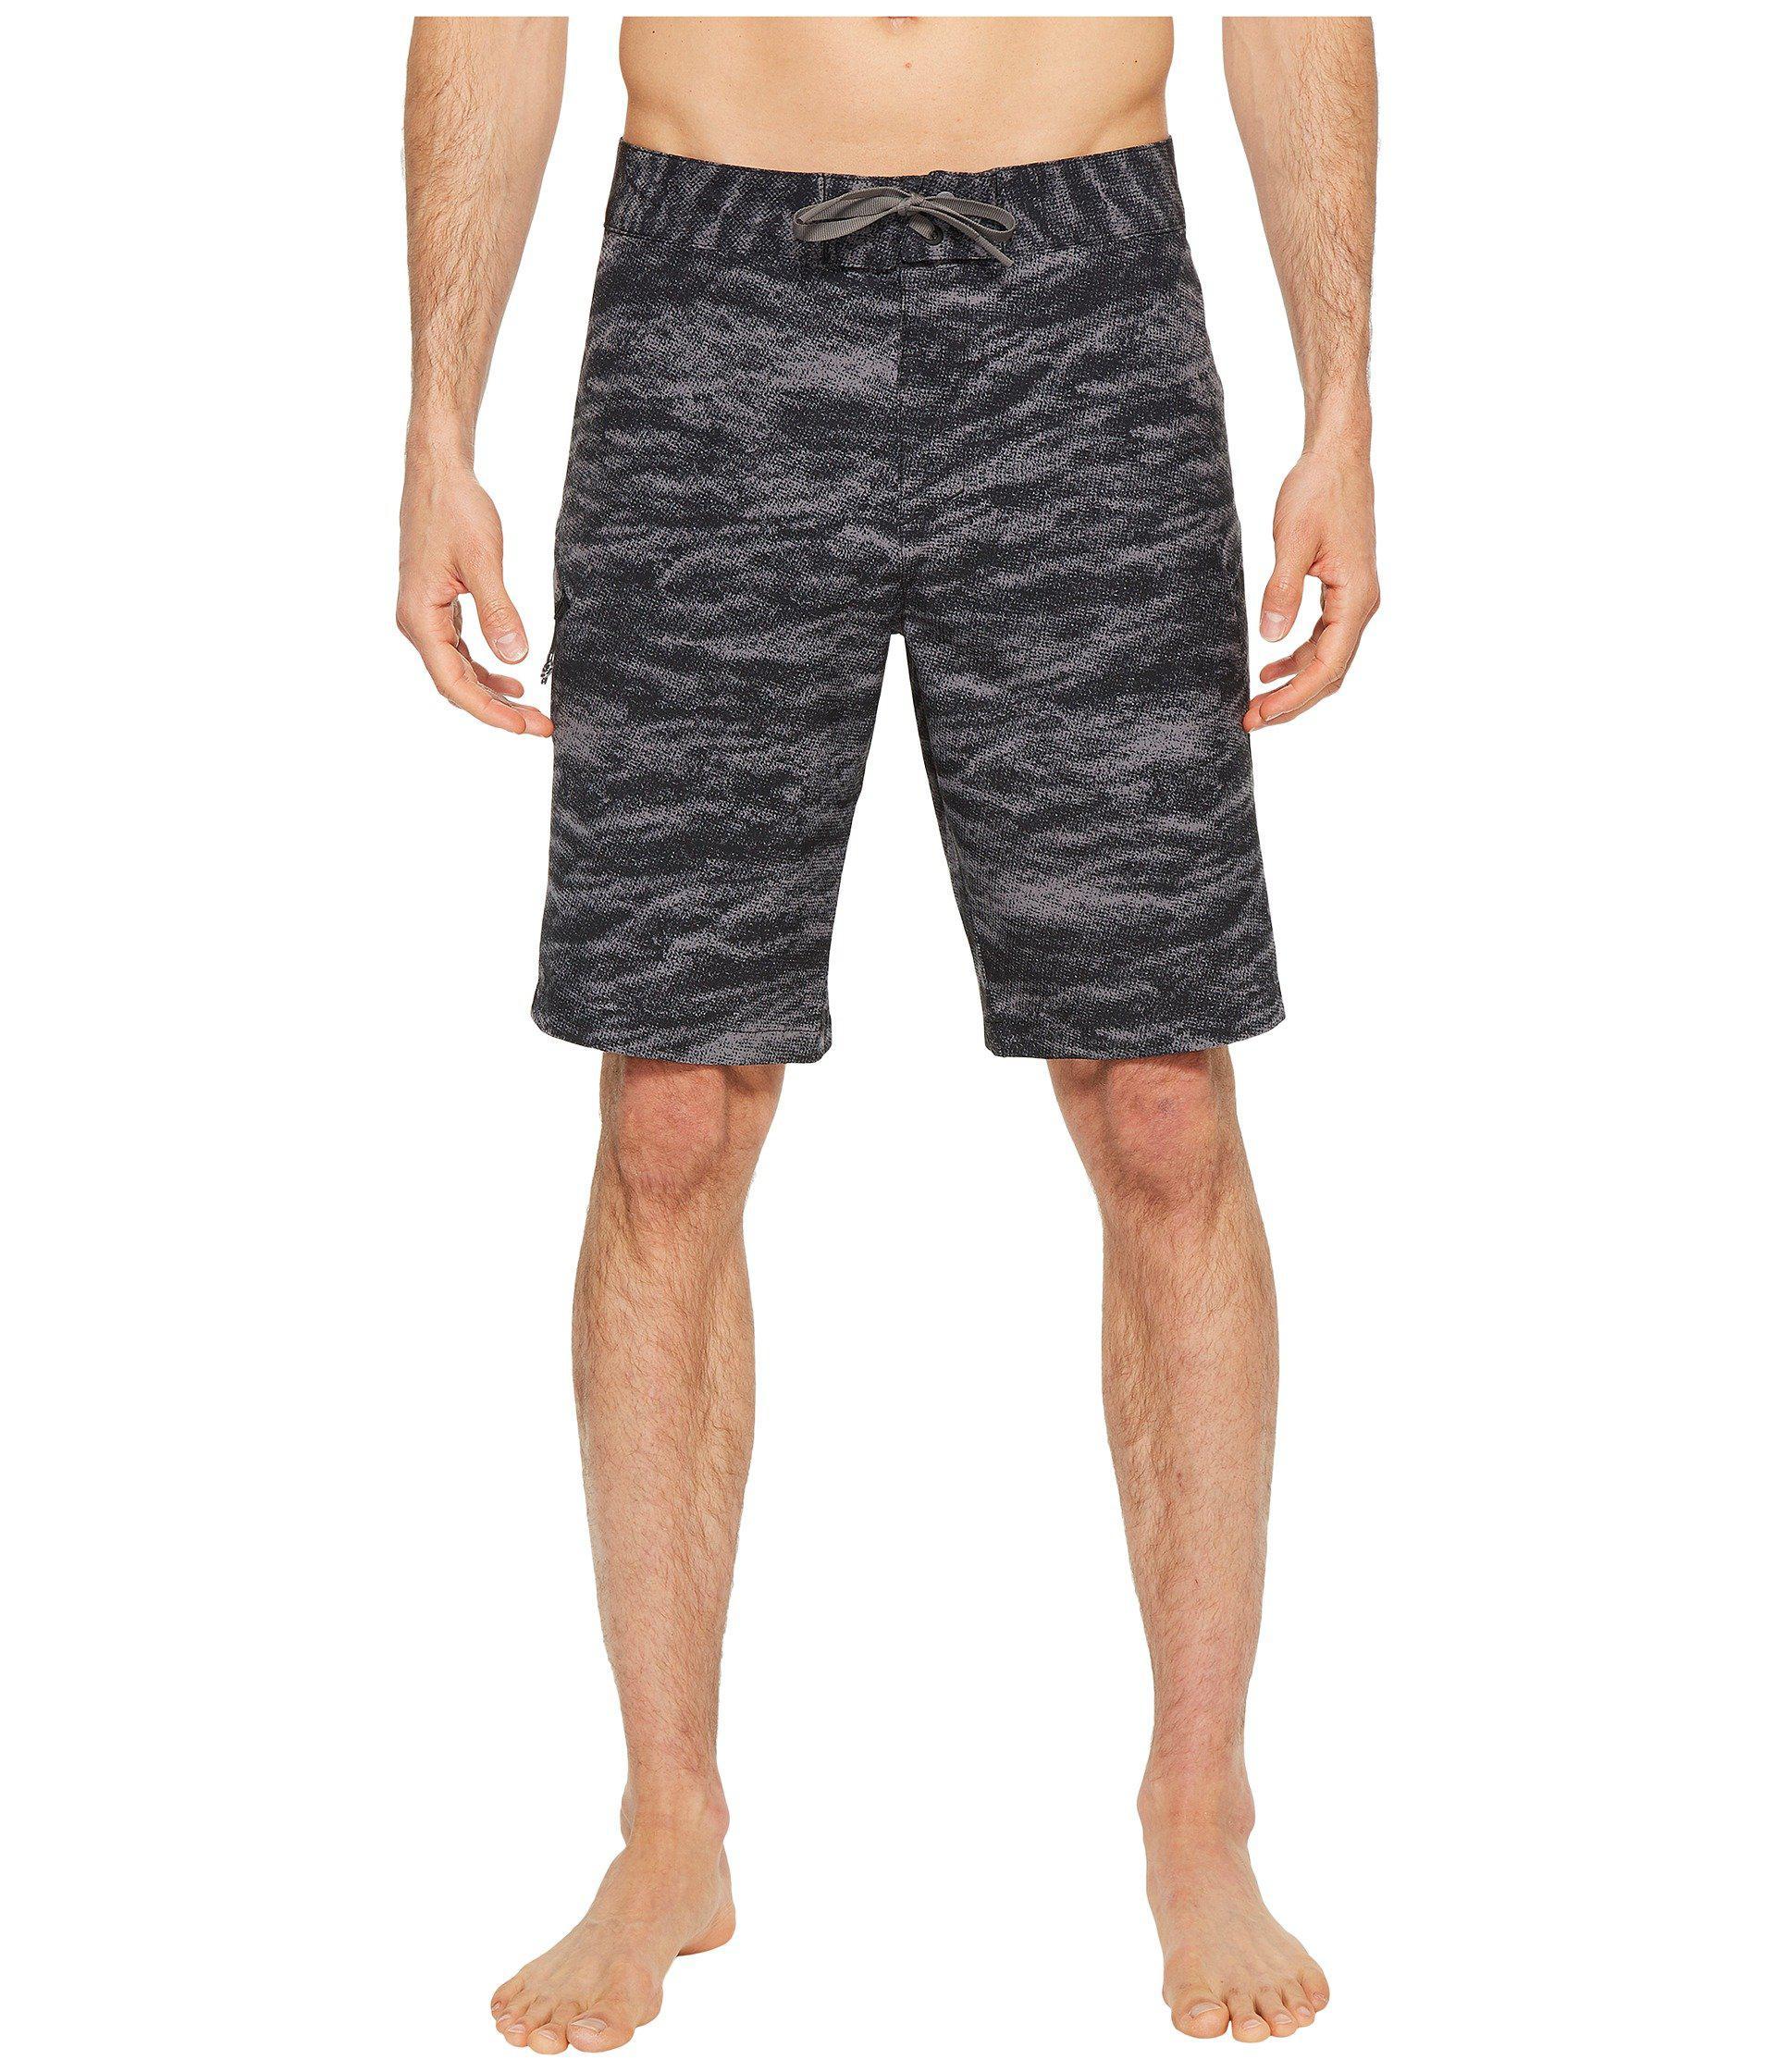 b211db0355674 Lyst - Under Armour Ua Reblek Printed Boardshorts in Black for Men ...